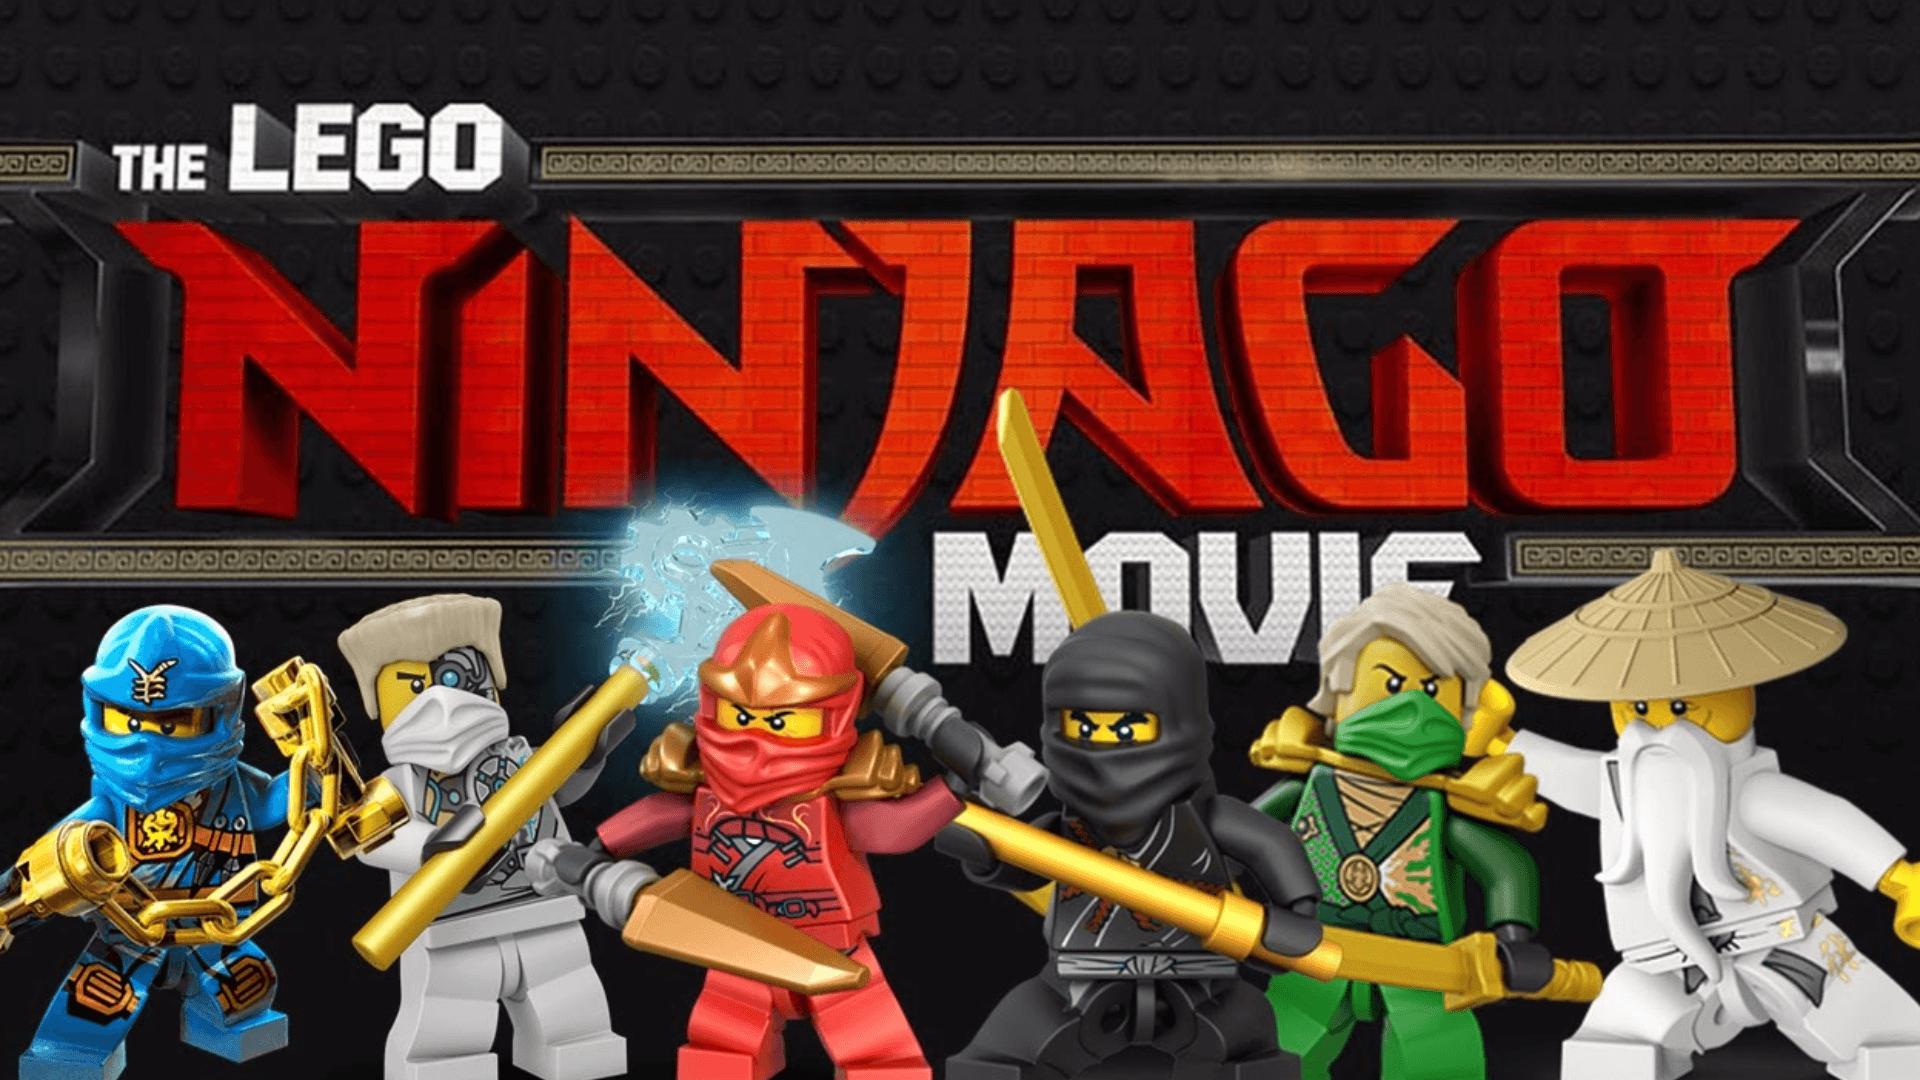 LEGO Ninjago Movie Wallpapers